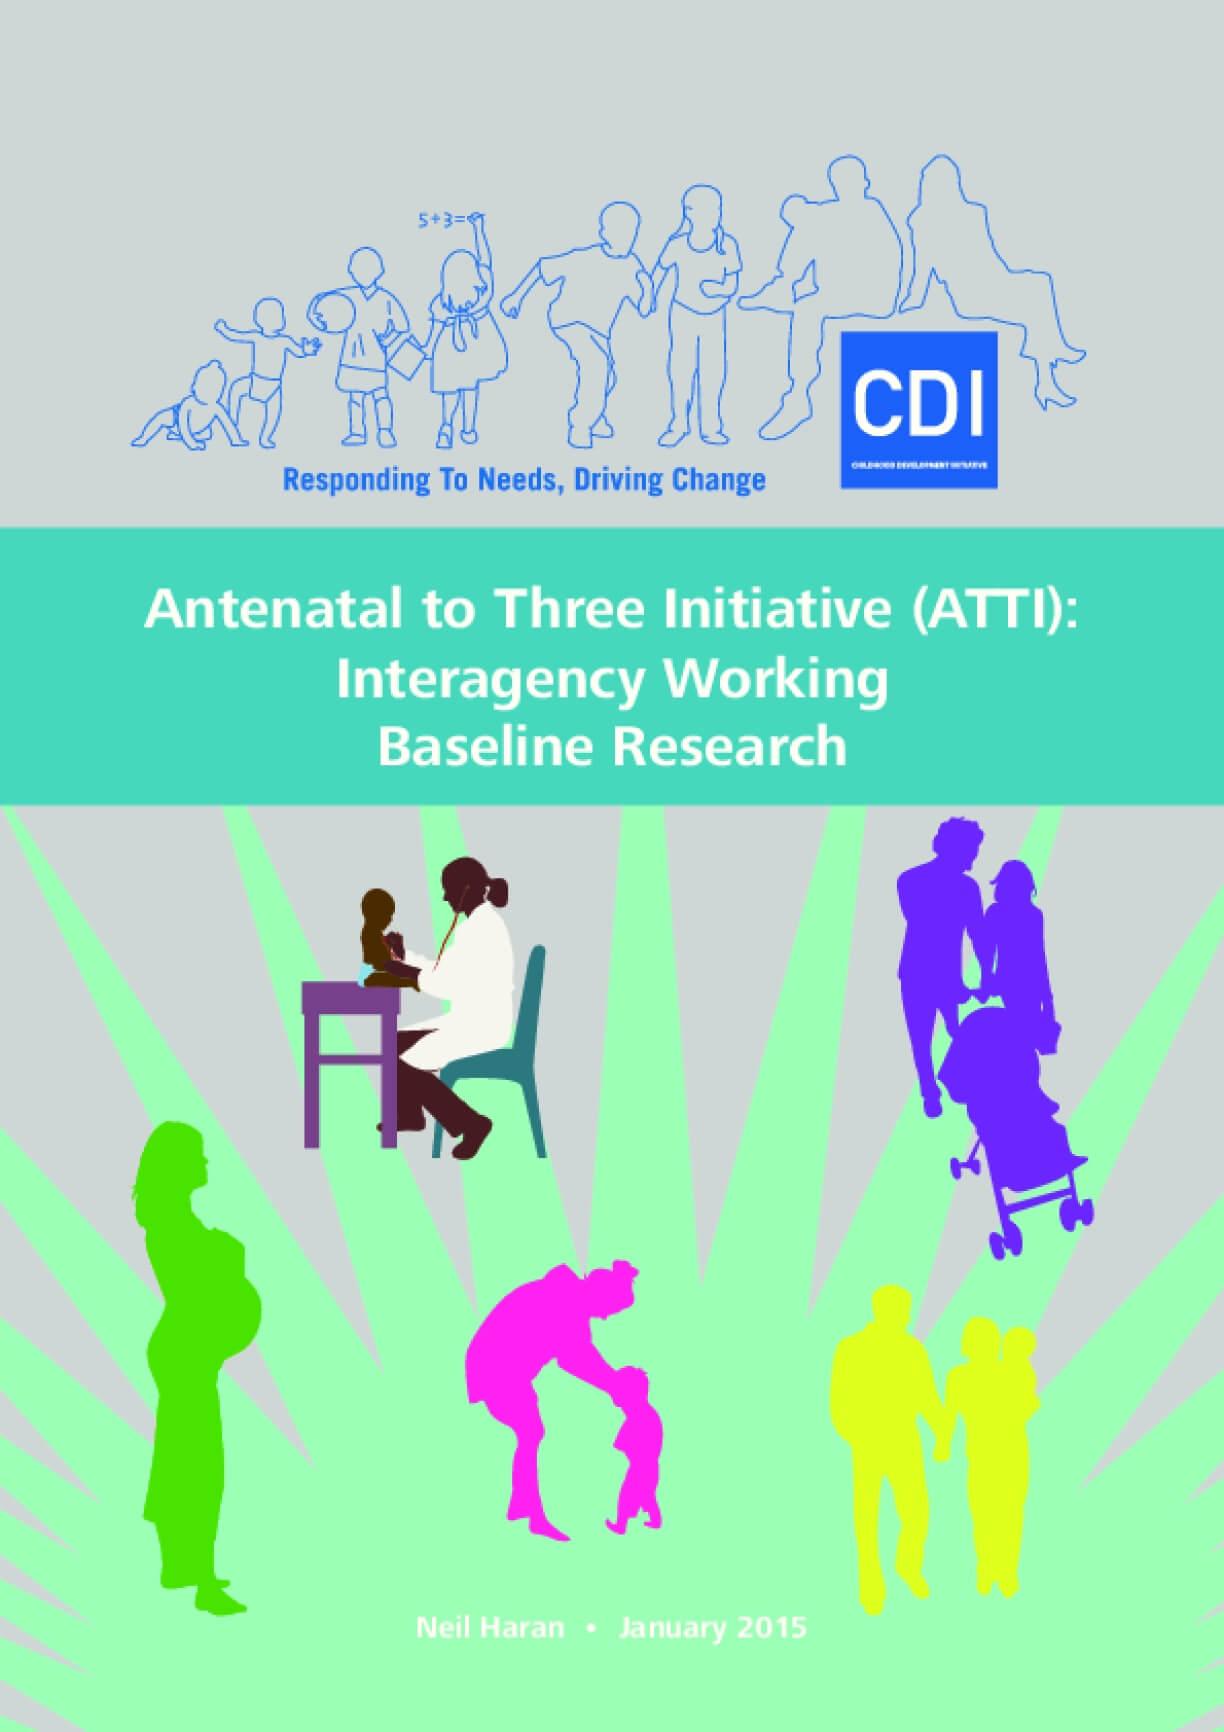 Antenatal to Three Initiative (ATTI): Interagency Working Baseline Research